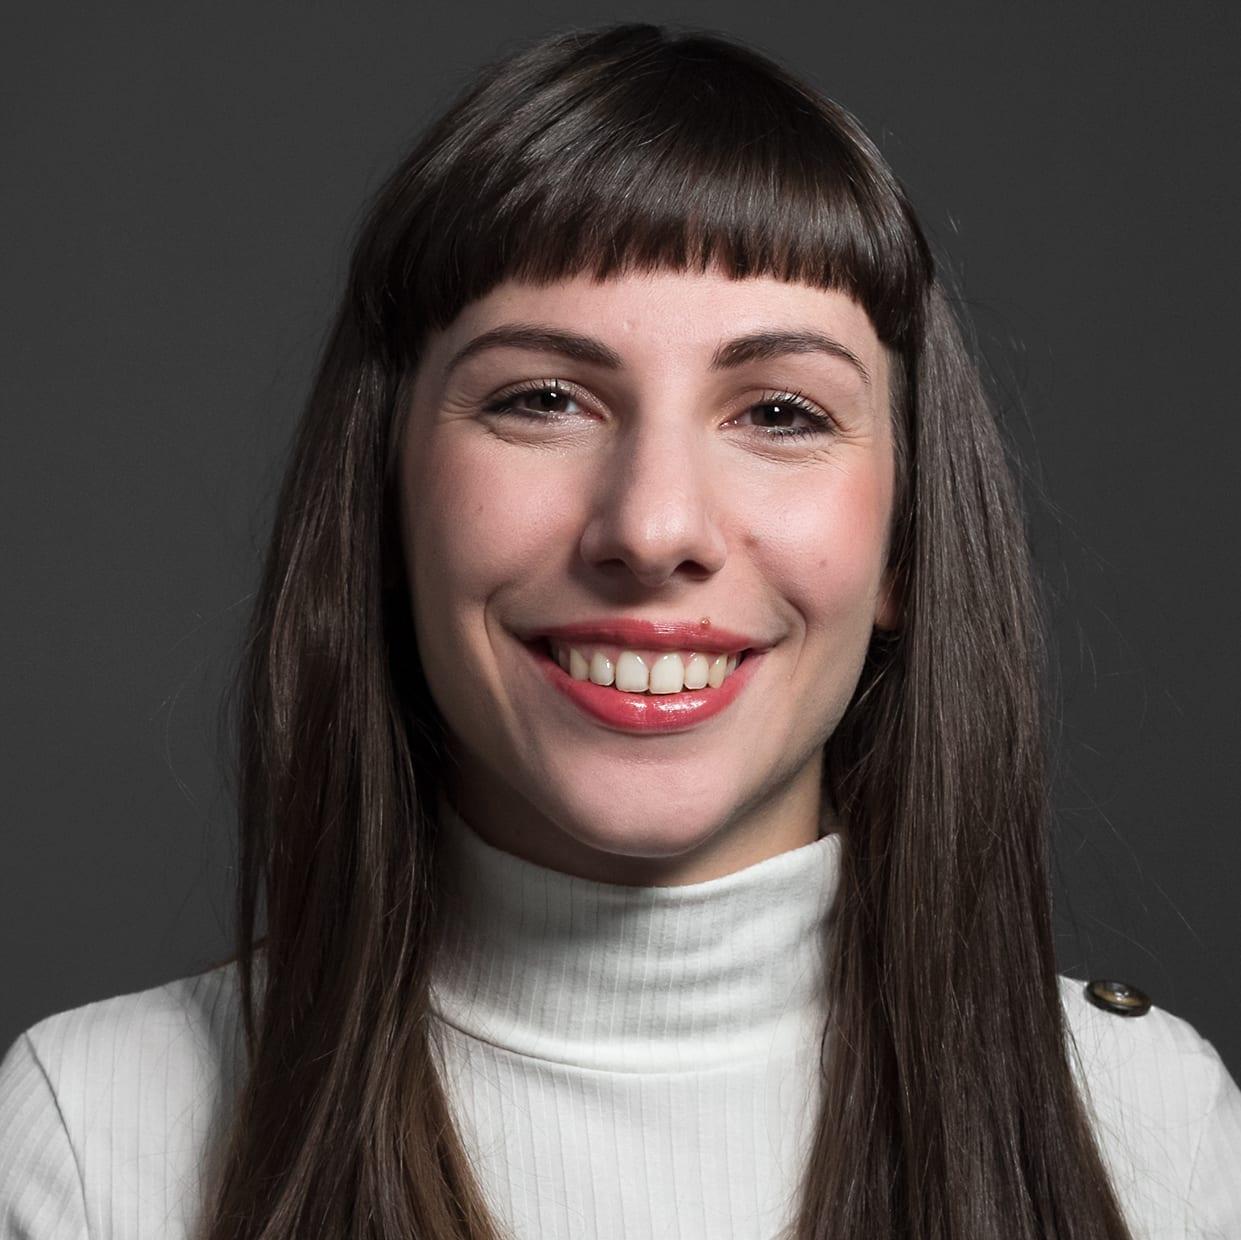 Orgænic Lifestyle Academy Erica Spasari